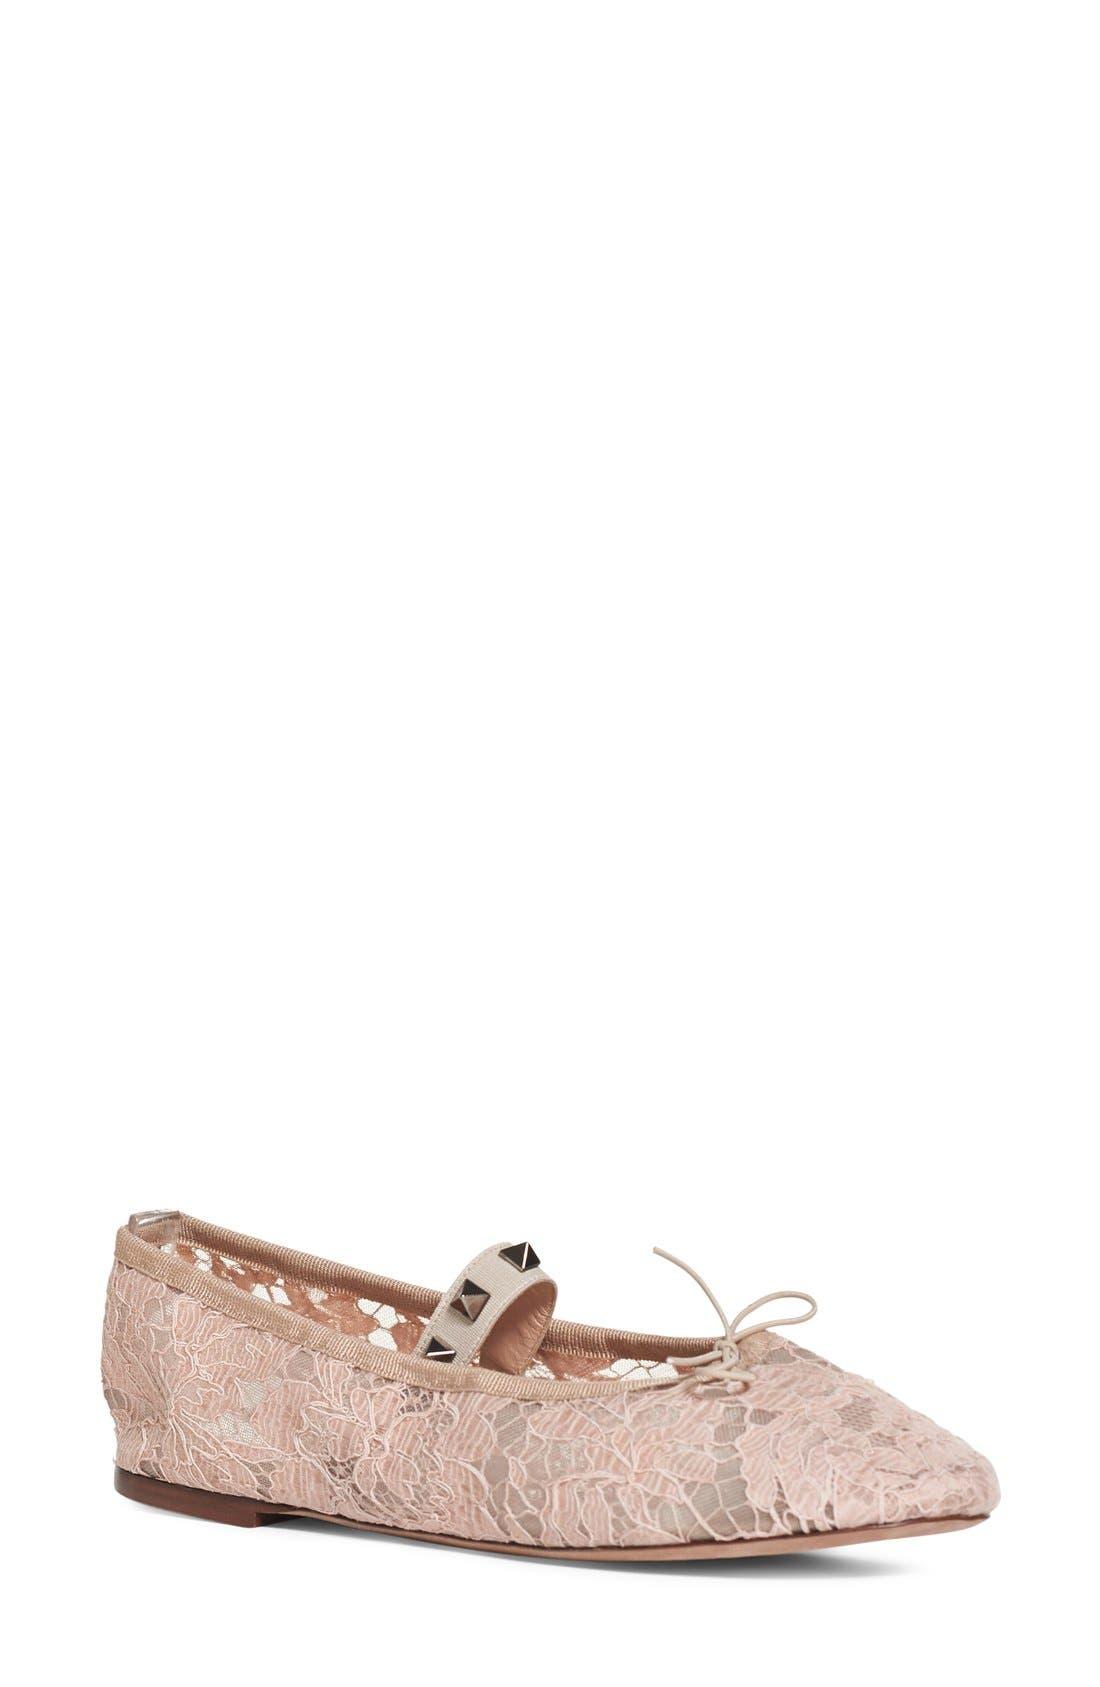 Main Image - Valentino 'Rockstud' Lace Ballet Flat (Women)